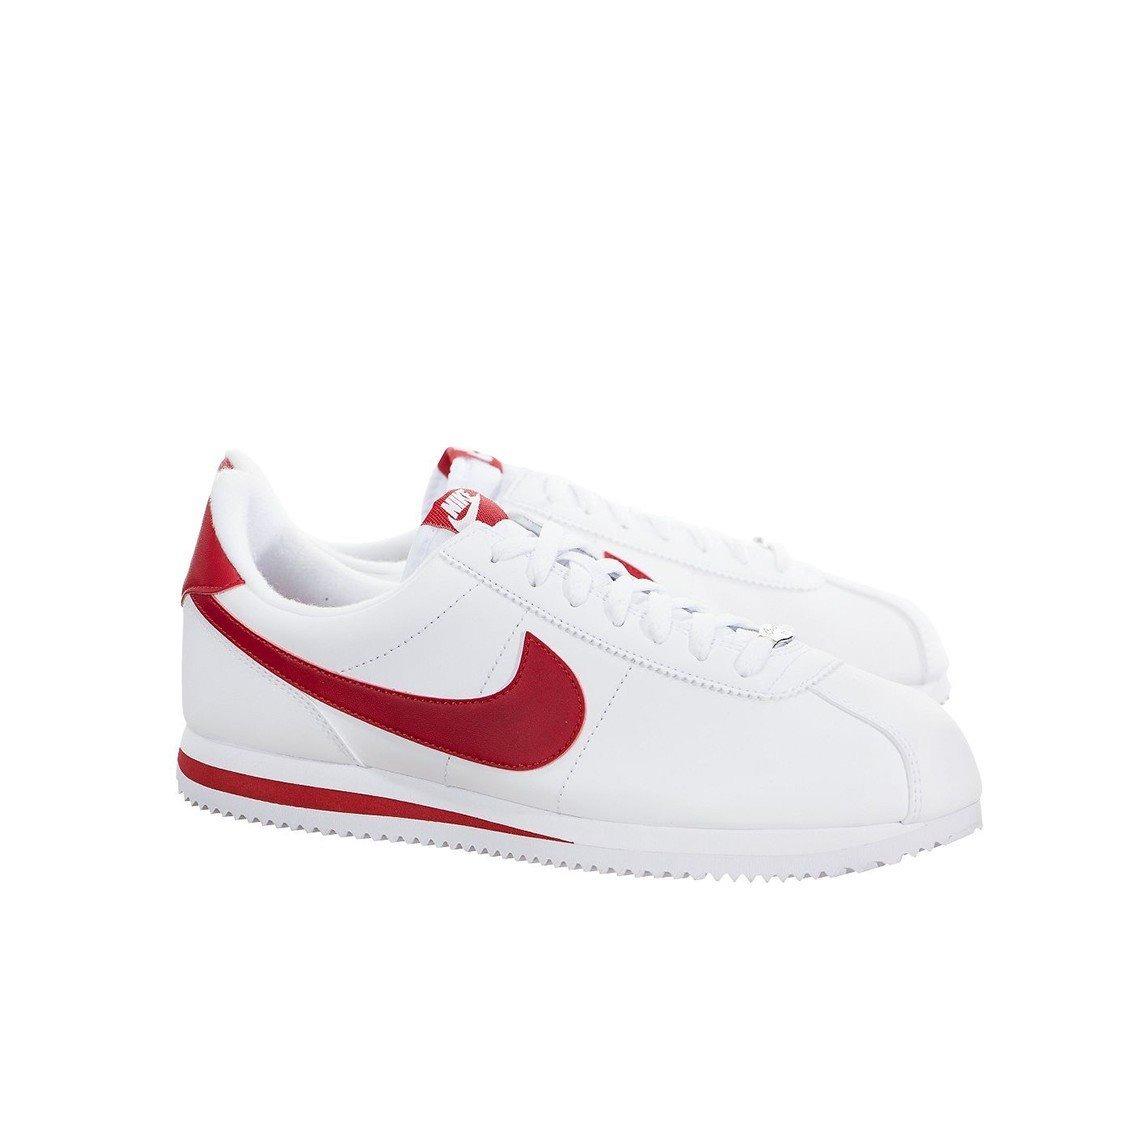 promo code ee6dc c9f11 Tenis Nike Cortez Leather Piel .- # 7 Original